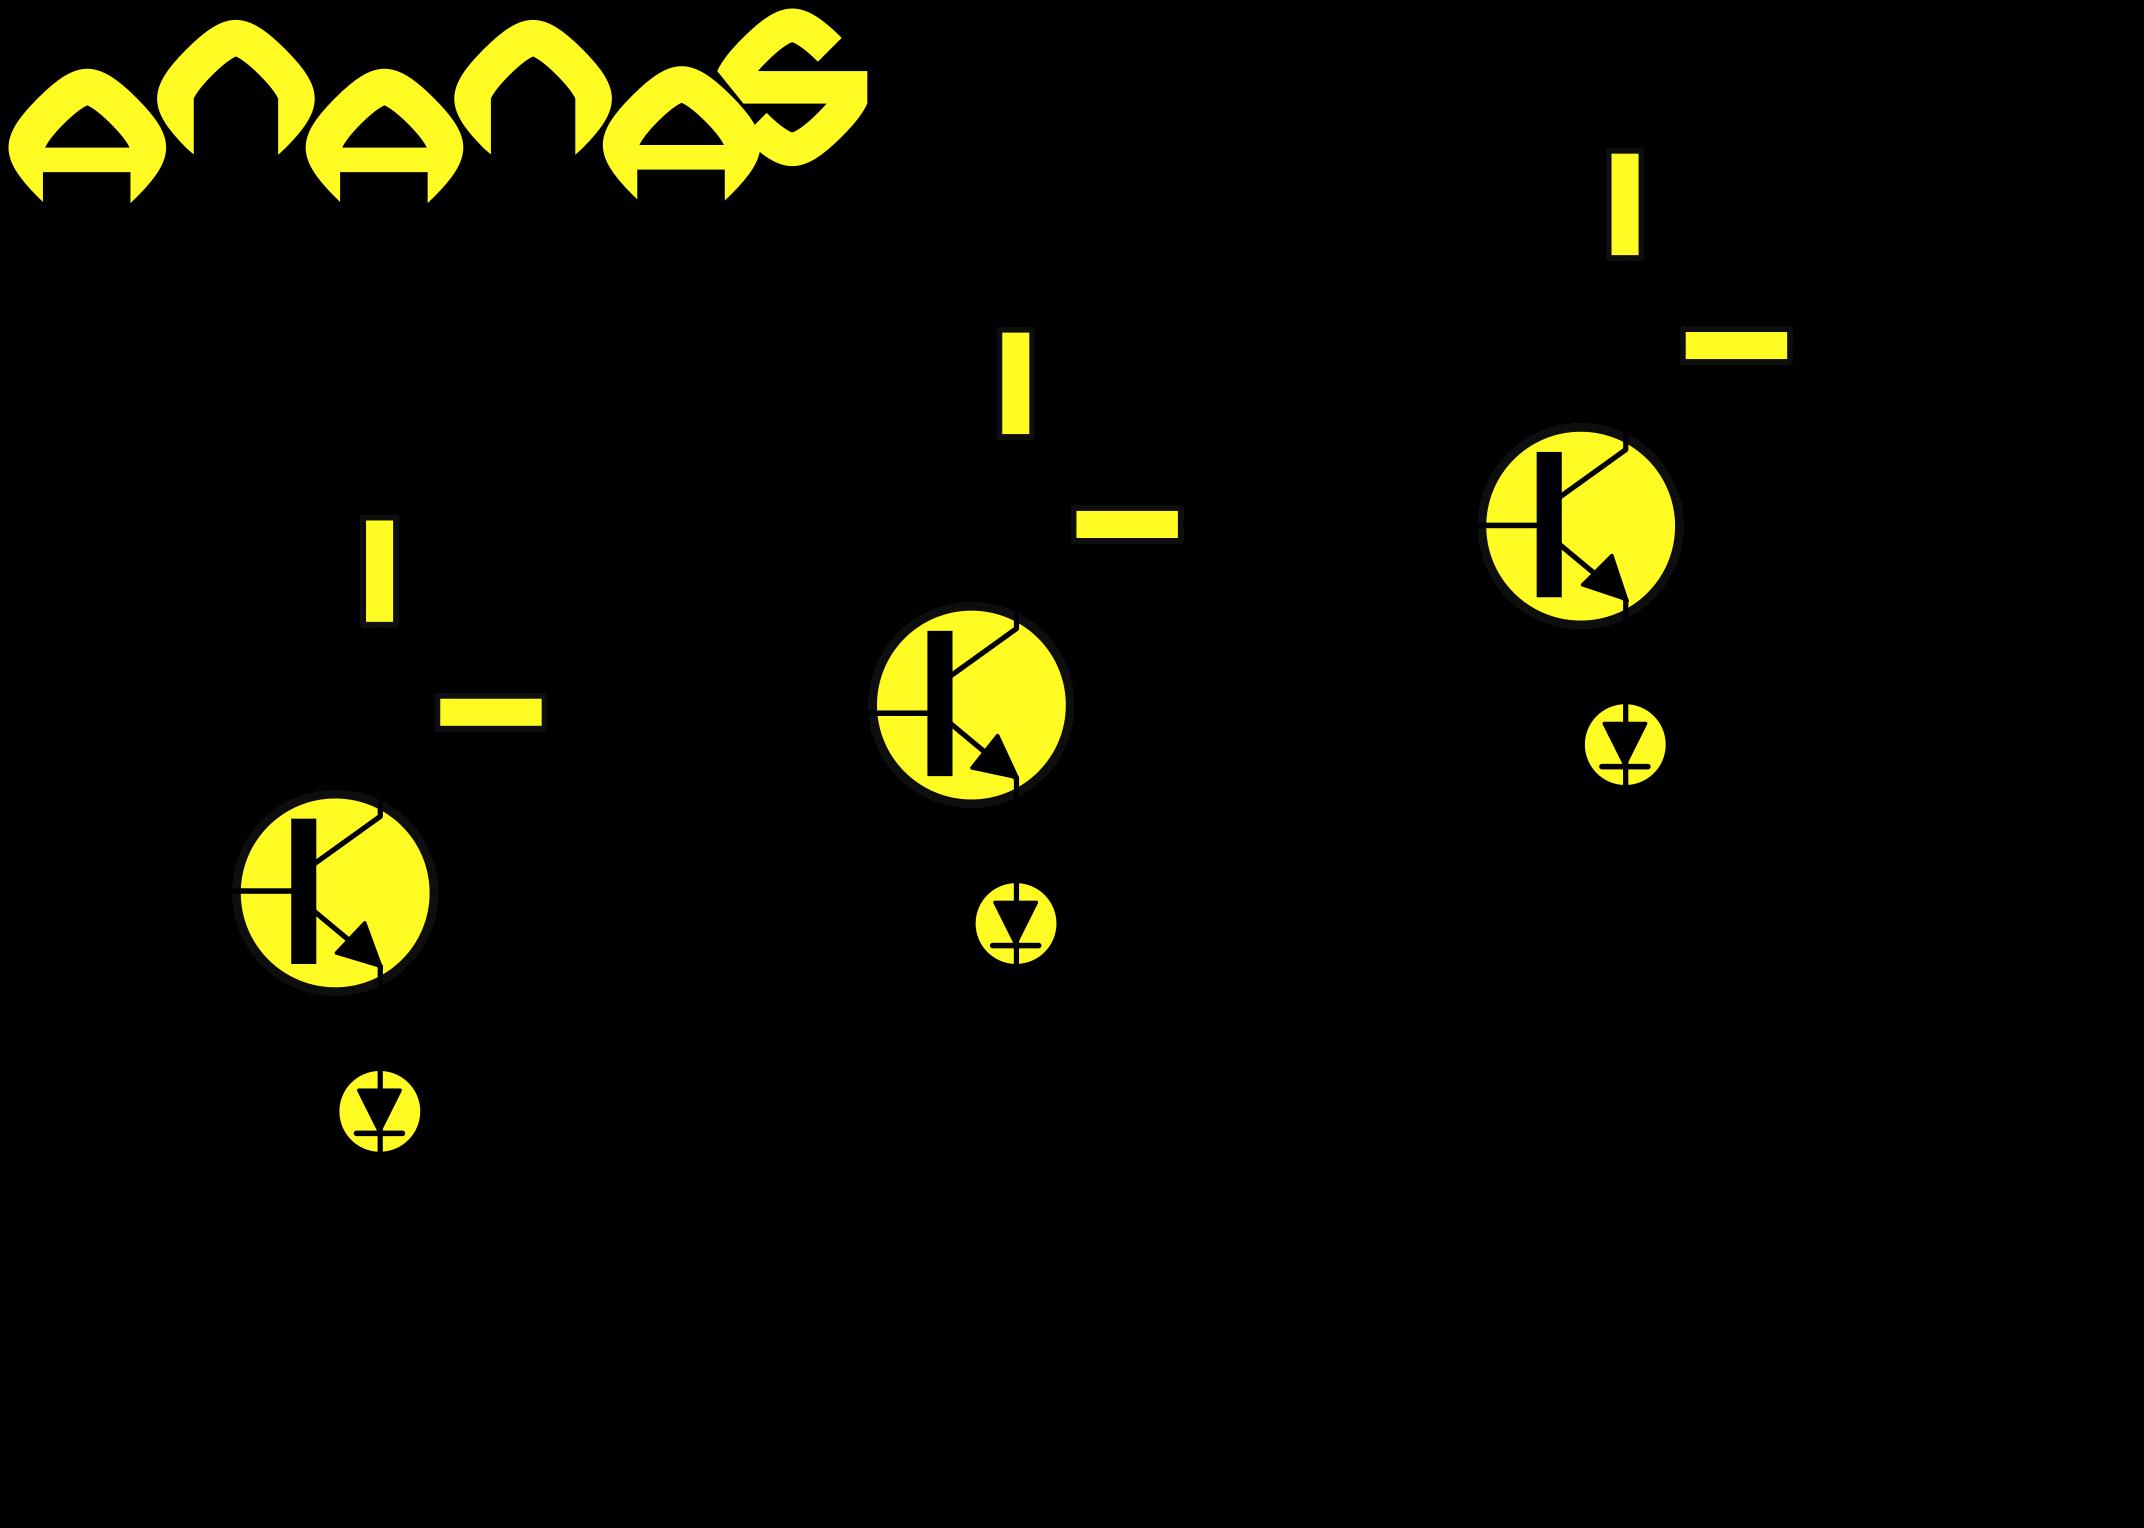 ananas-schem.png